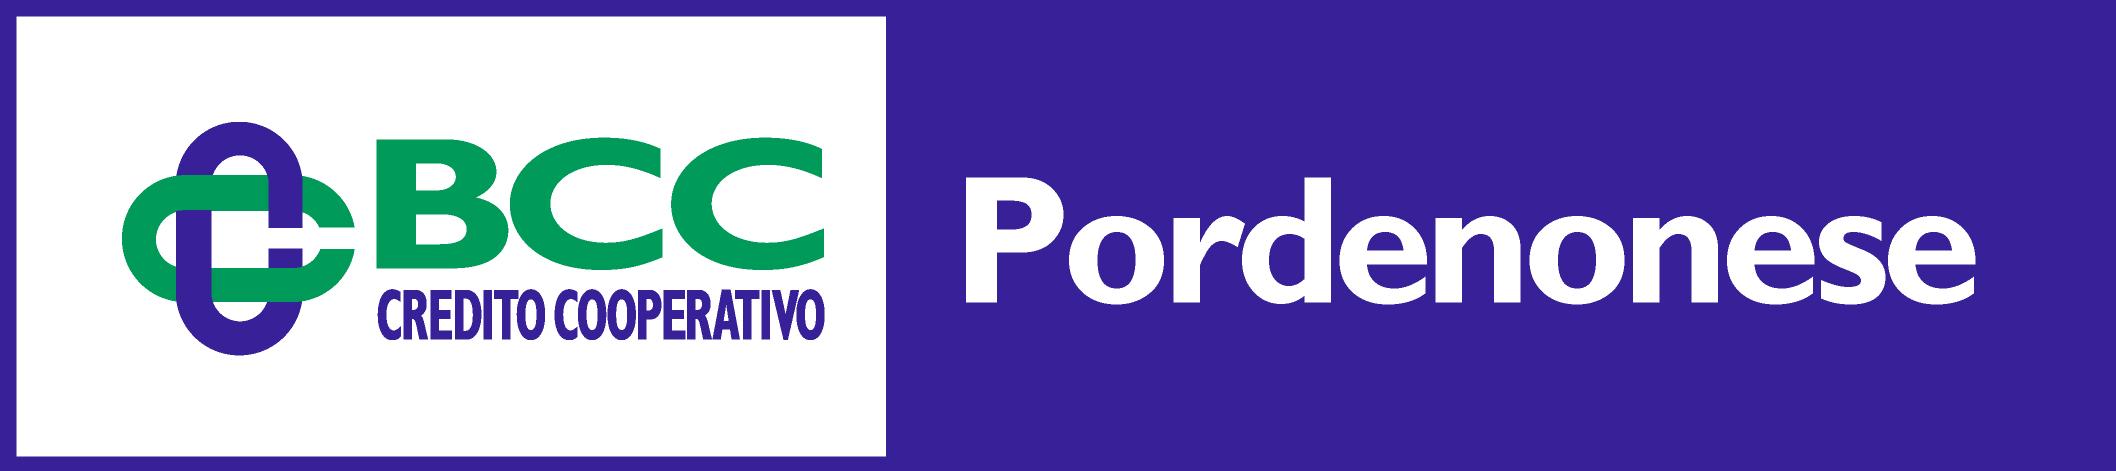 BCC Pordenonese